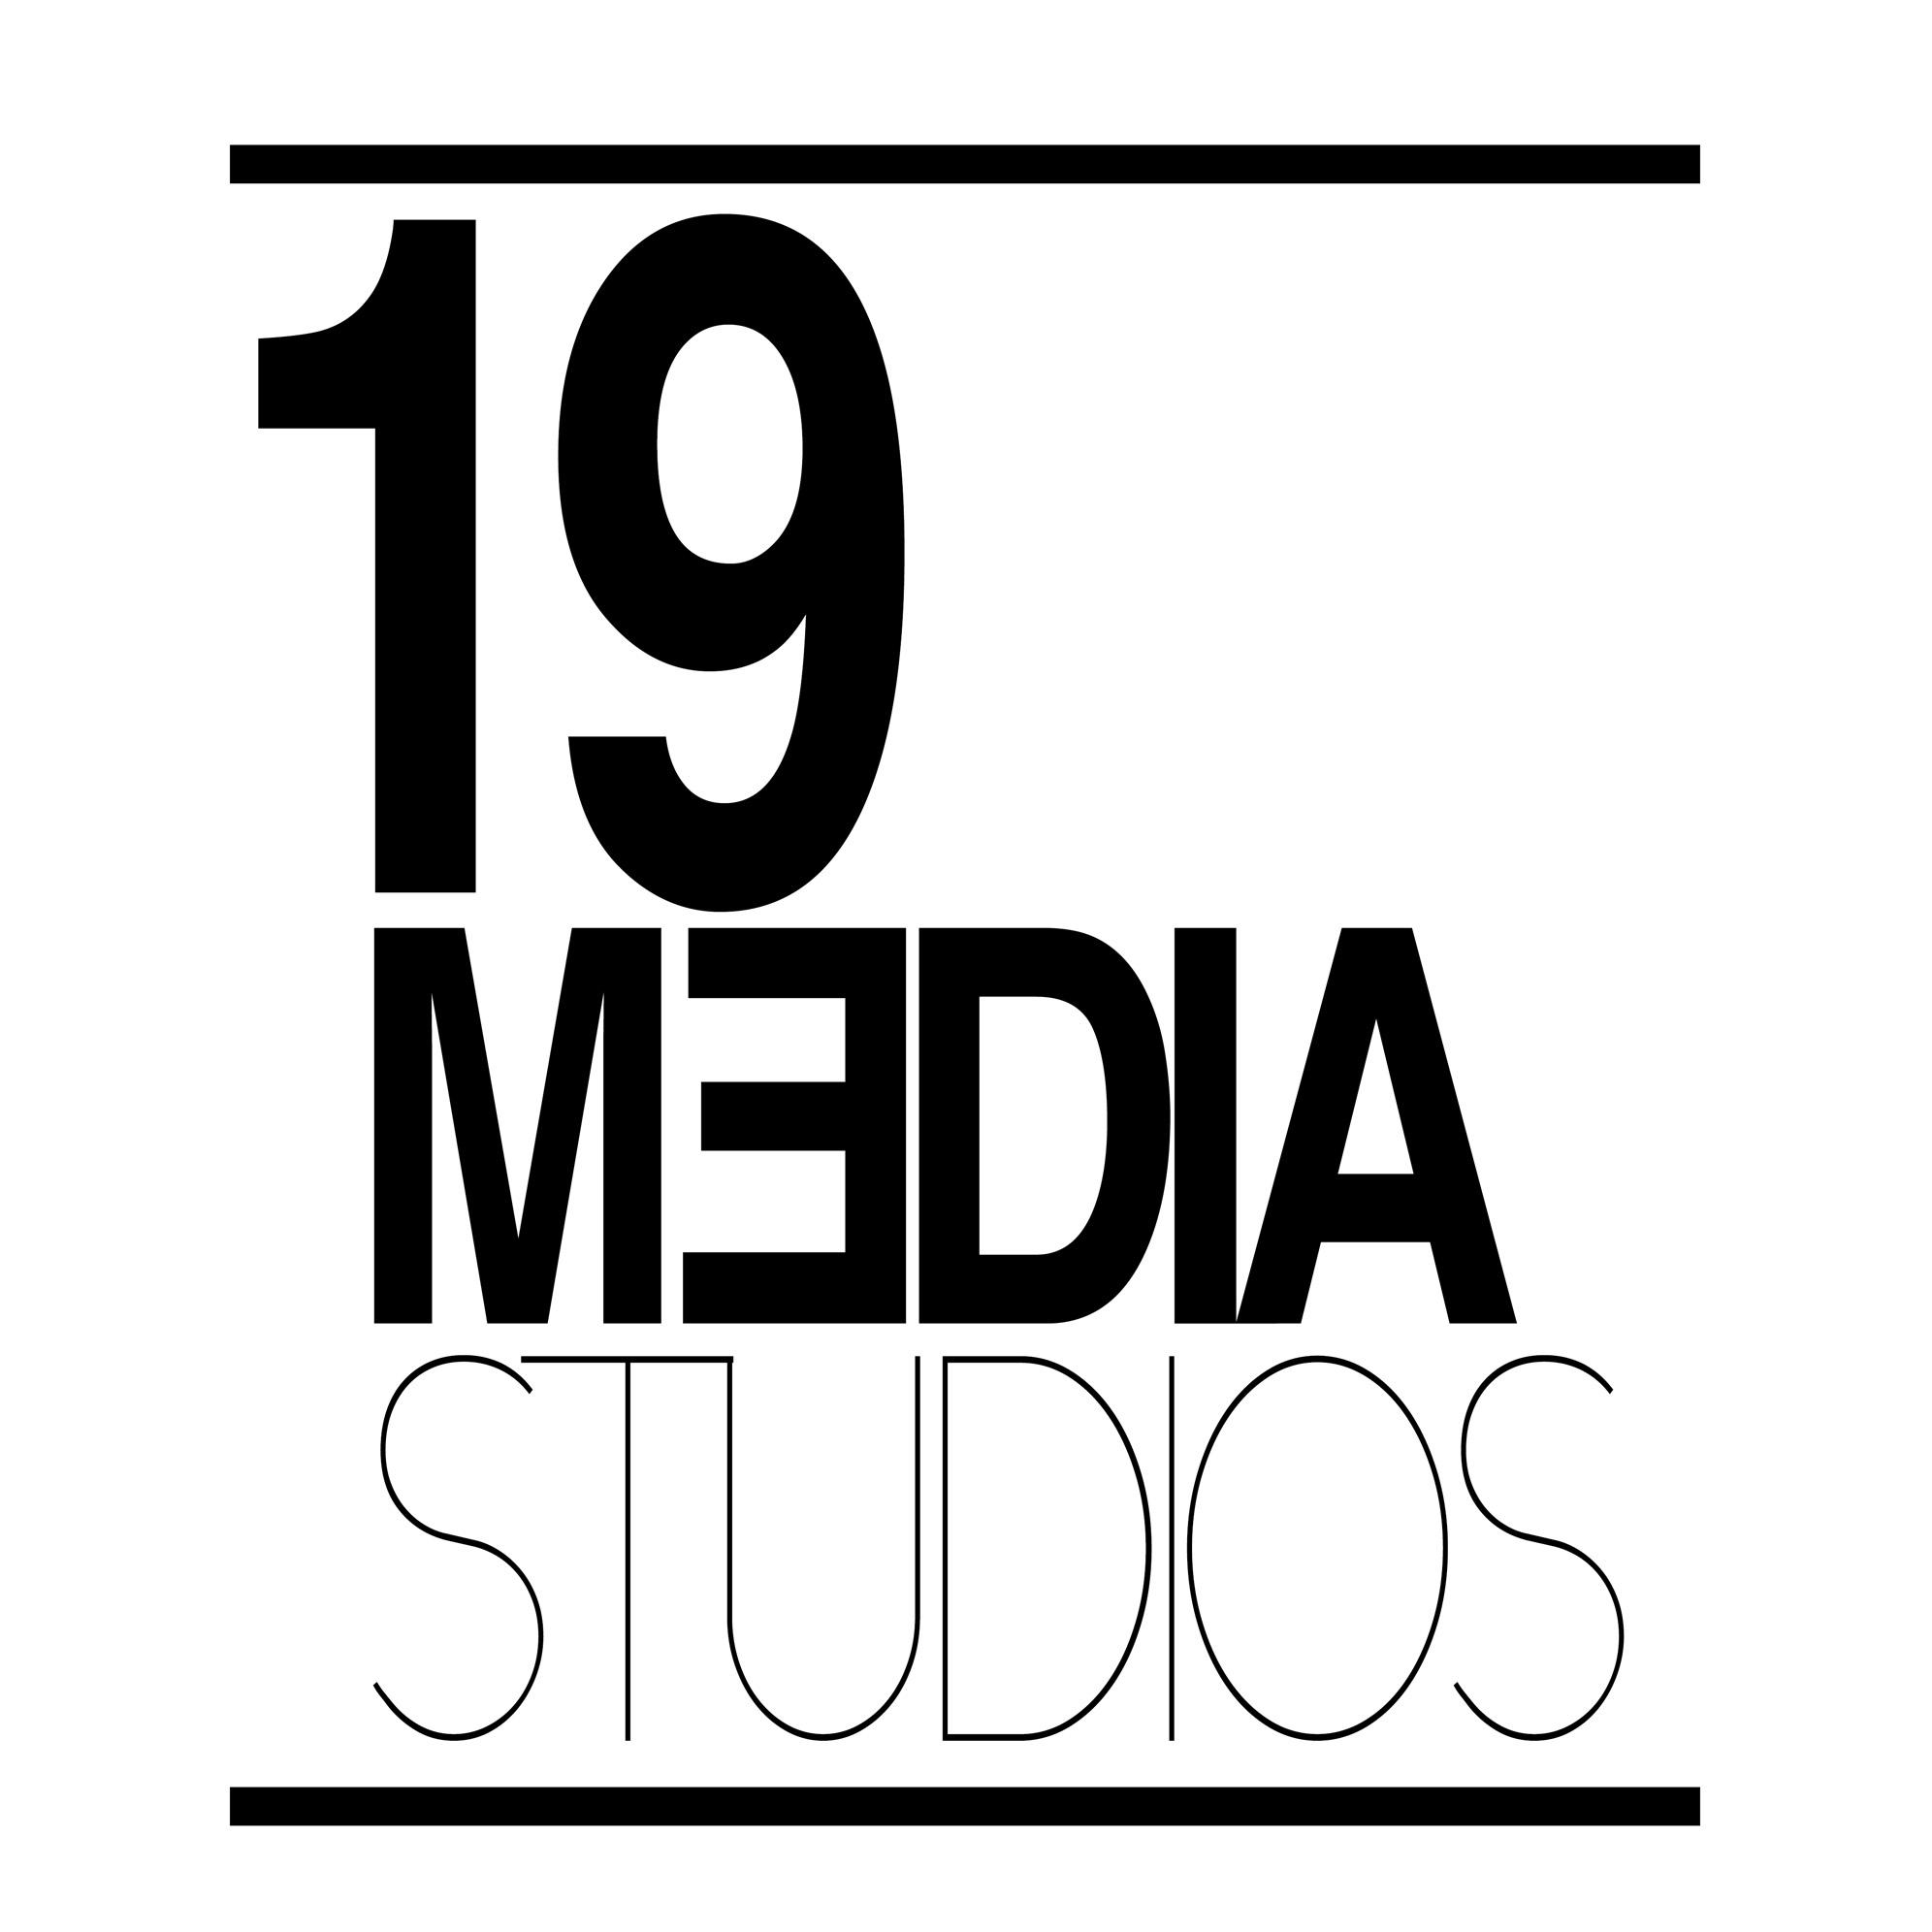 19mediastudios